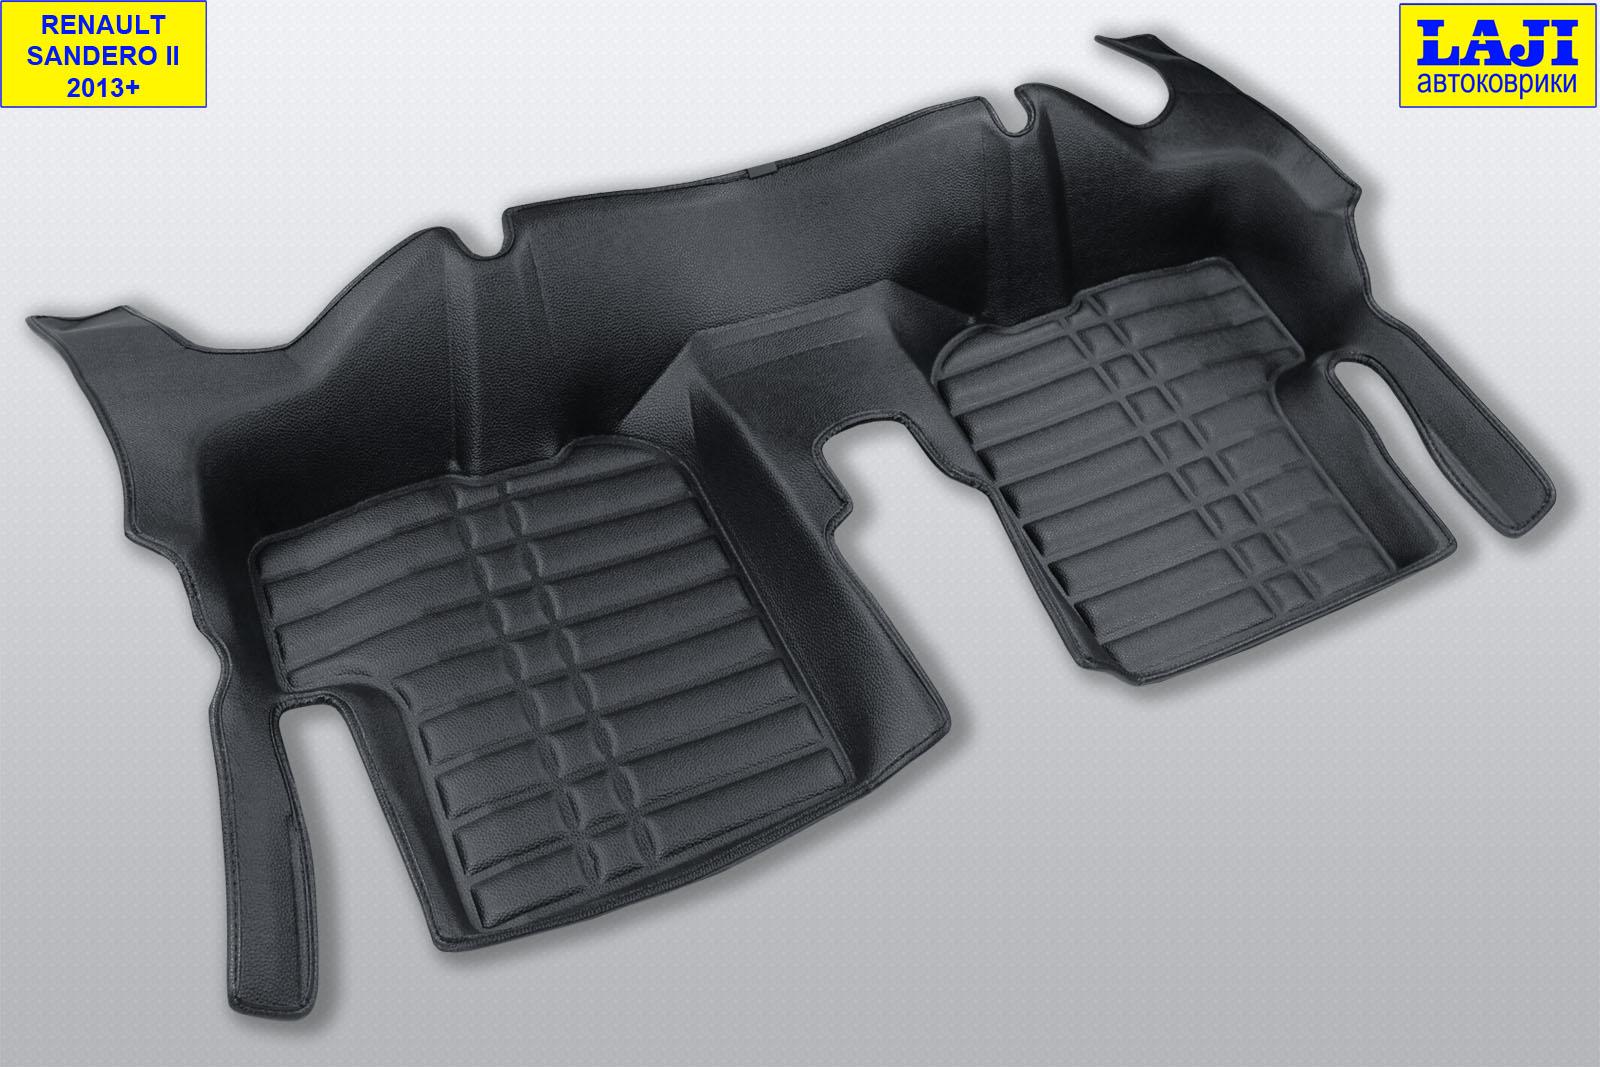 5D коврики в салон Renault Sandero 2 2014-н.в. 10